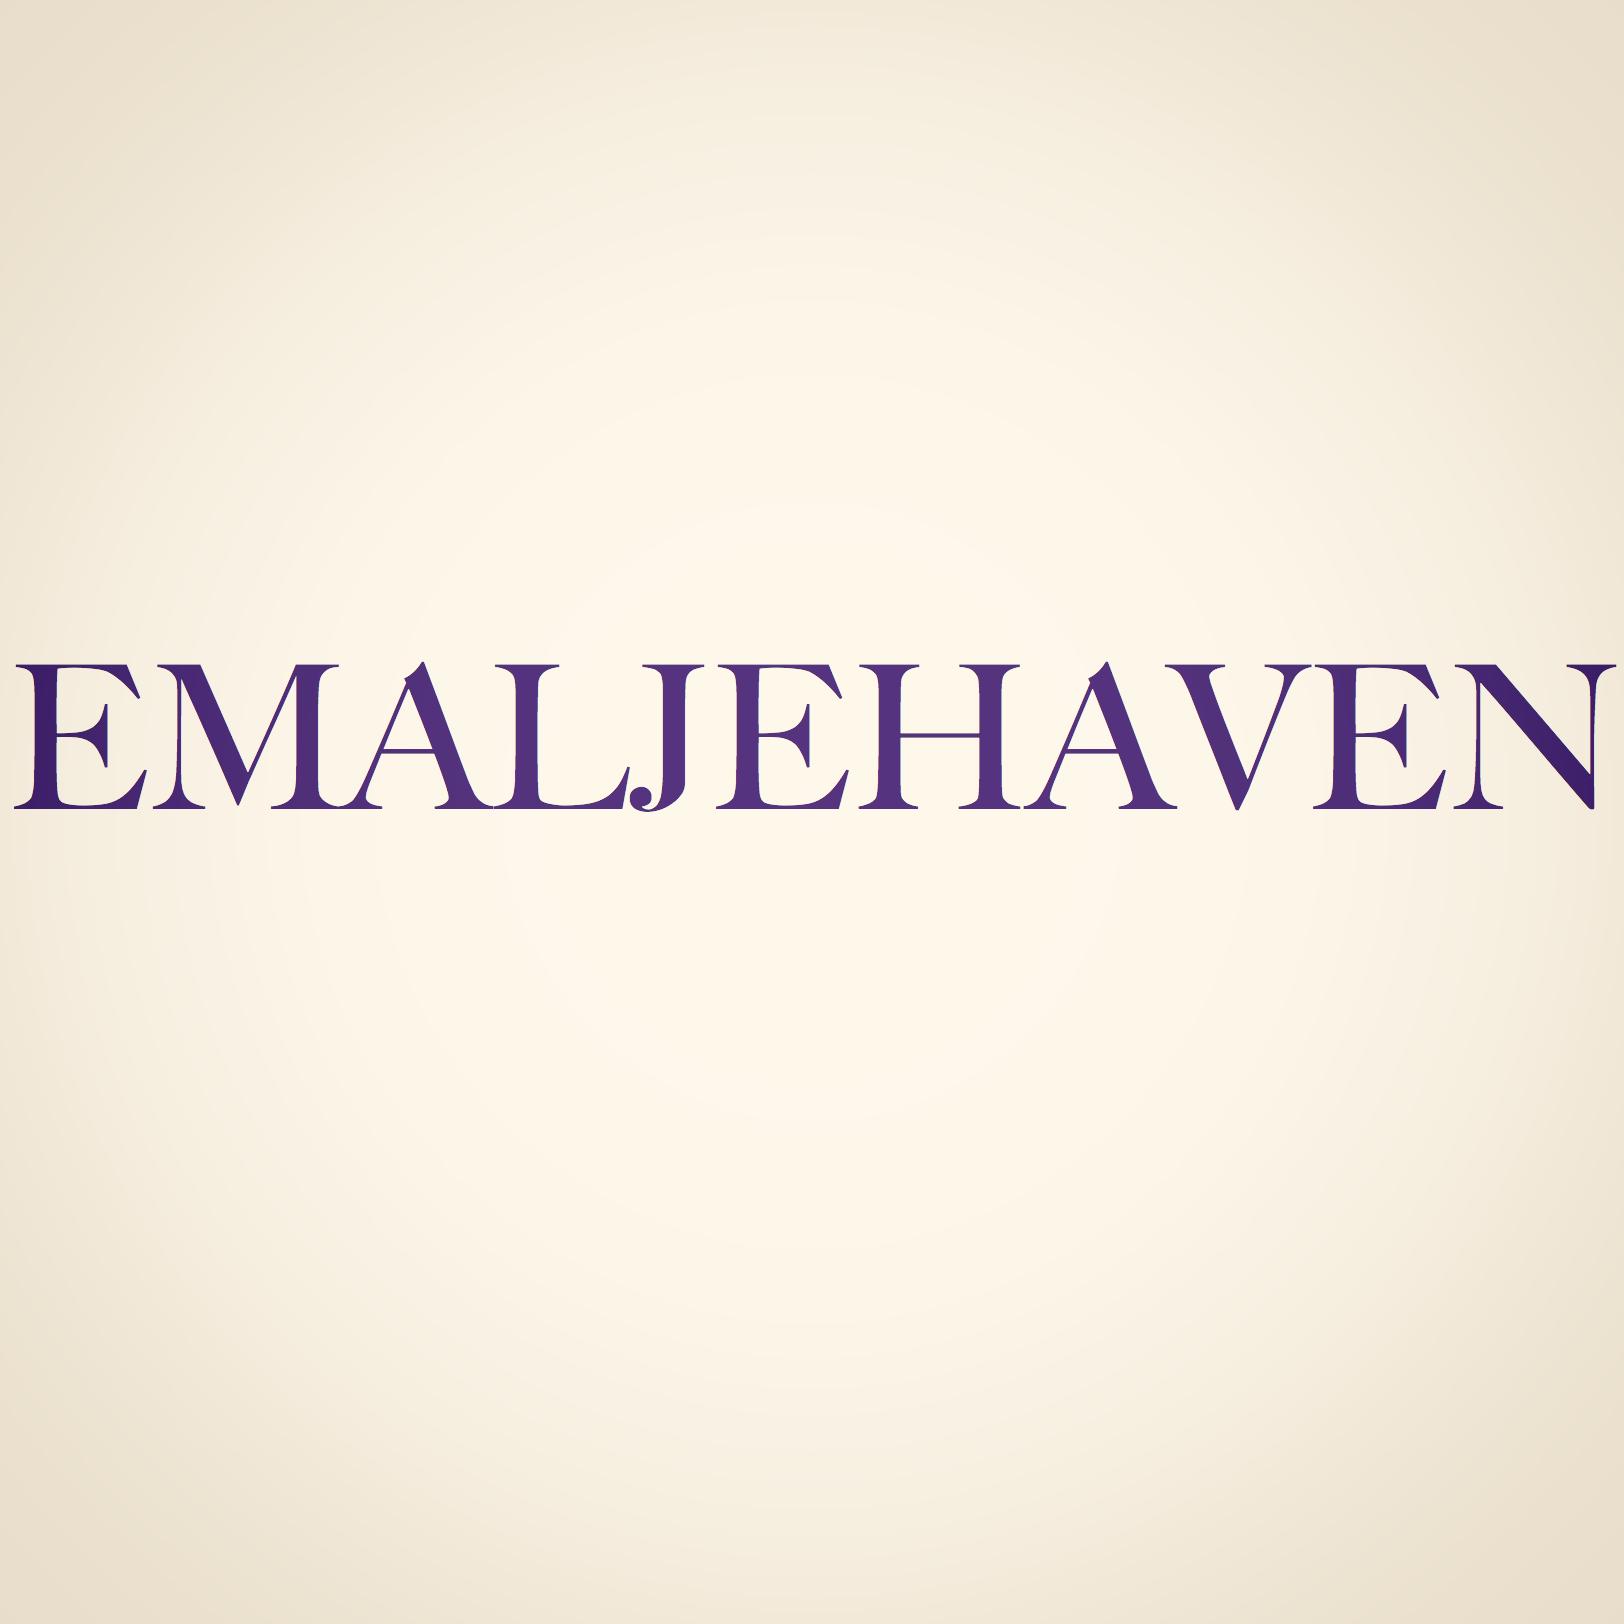 Emaljehaven